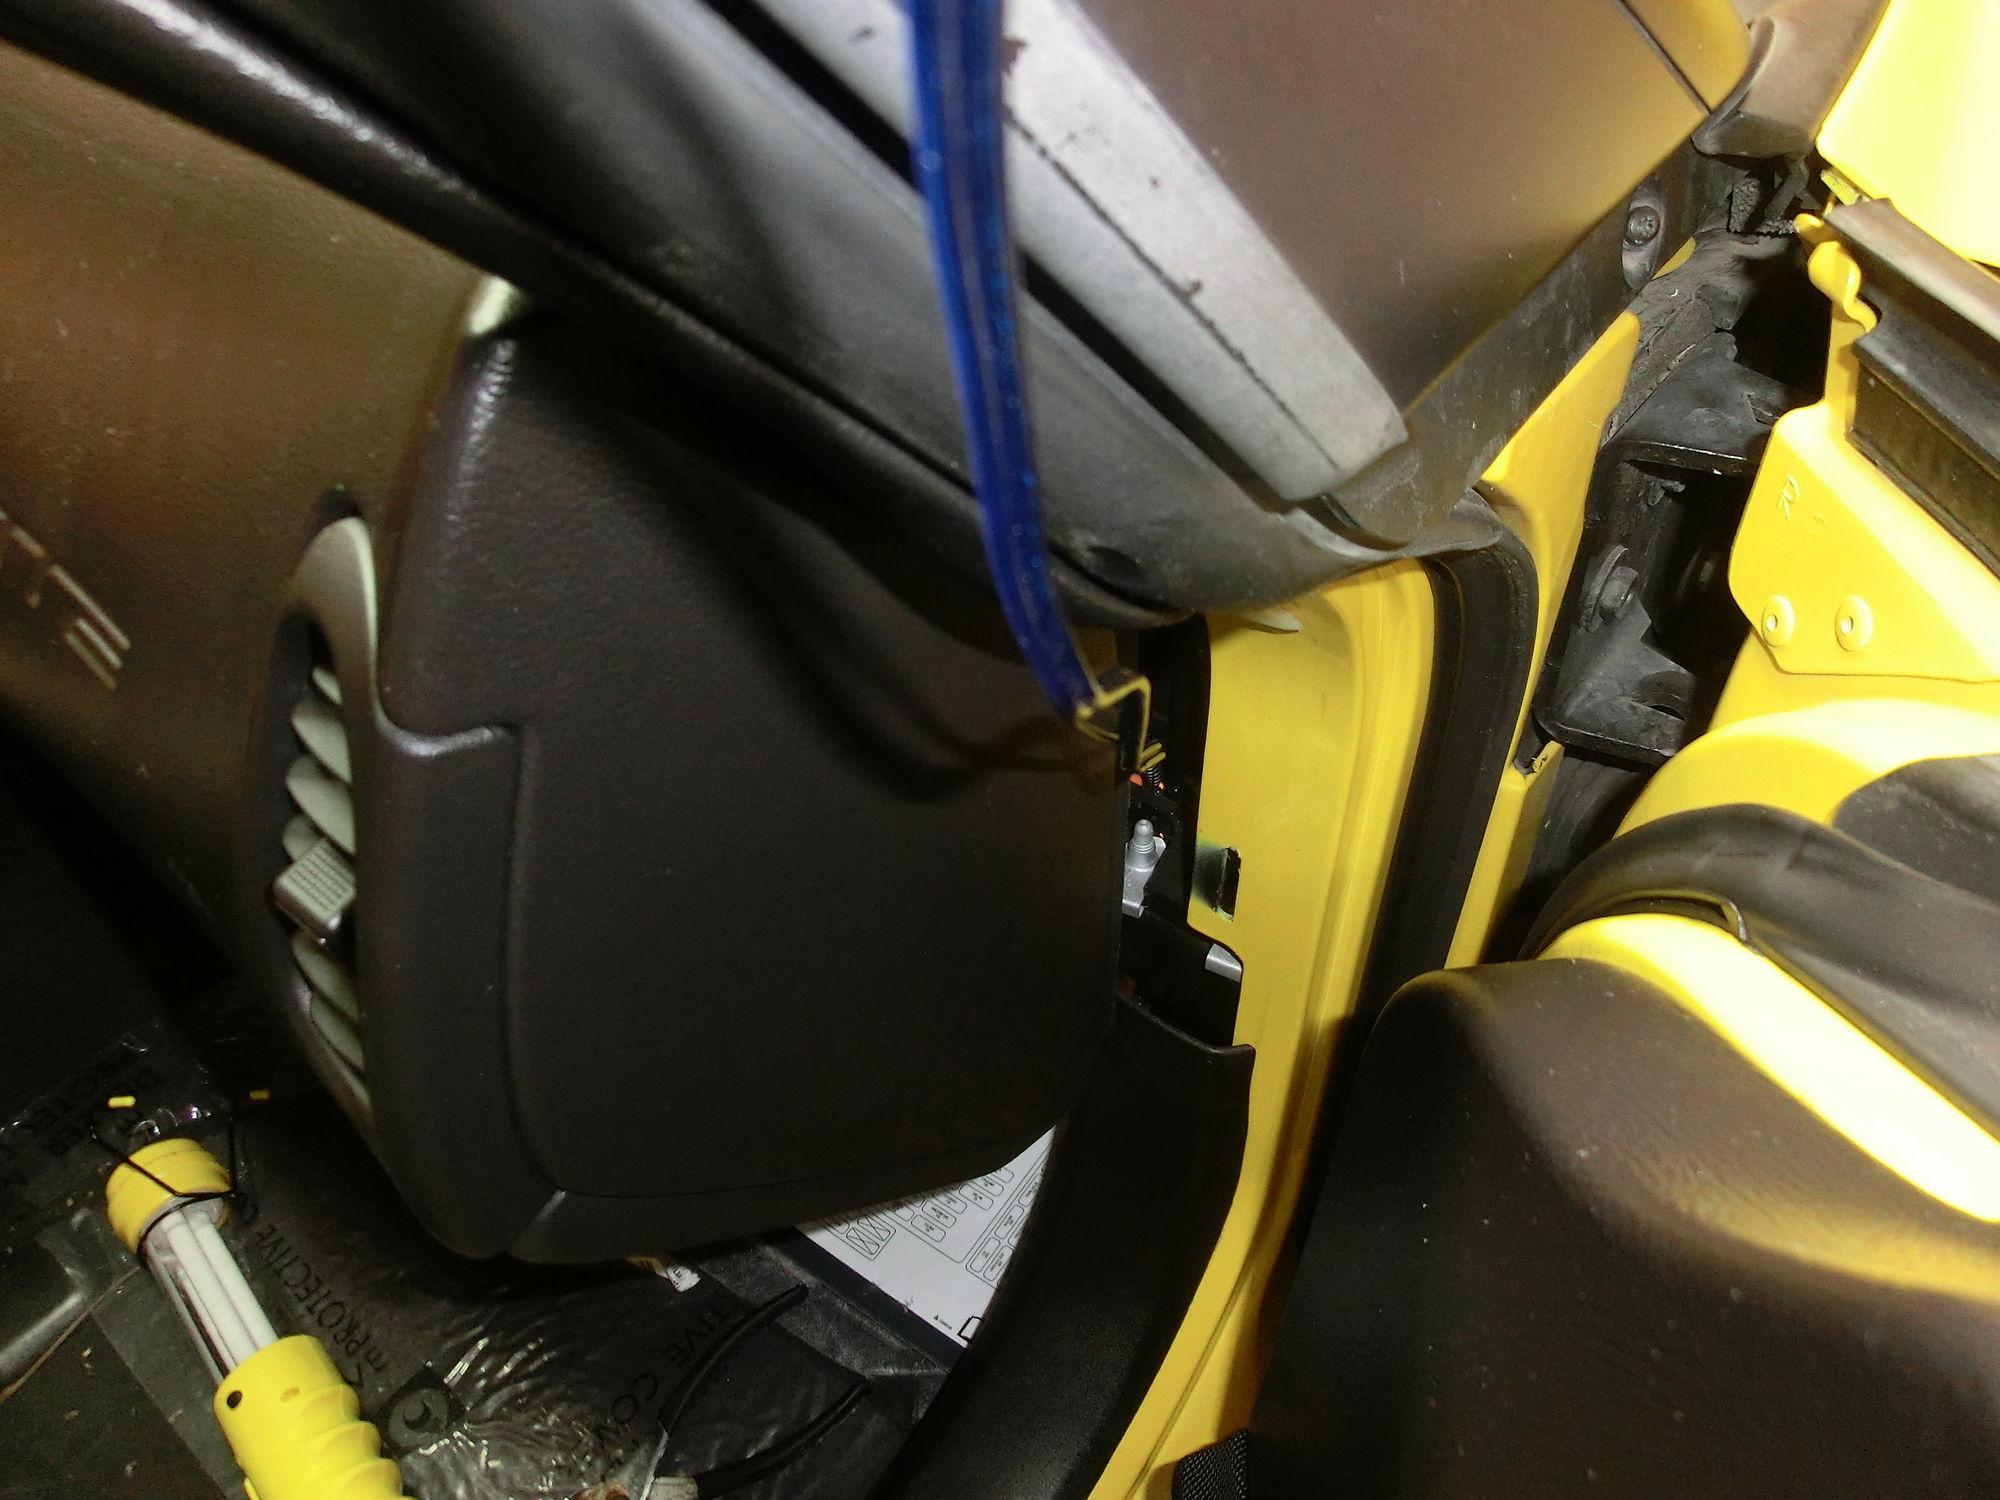 80 cimg3060_e4cd79521390029119e02dc3872c060fe128785b wiring diagram for rear view mirror corvetteforum chevrolet  at soozxer.org